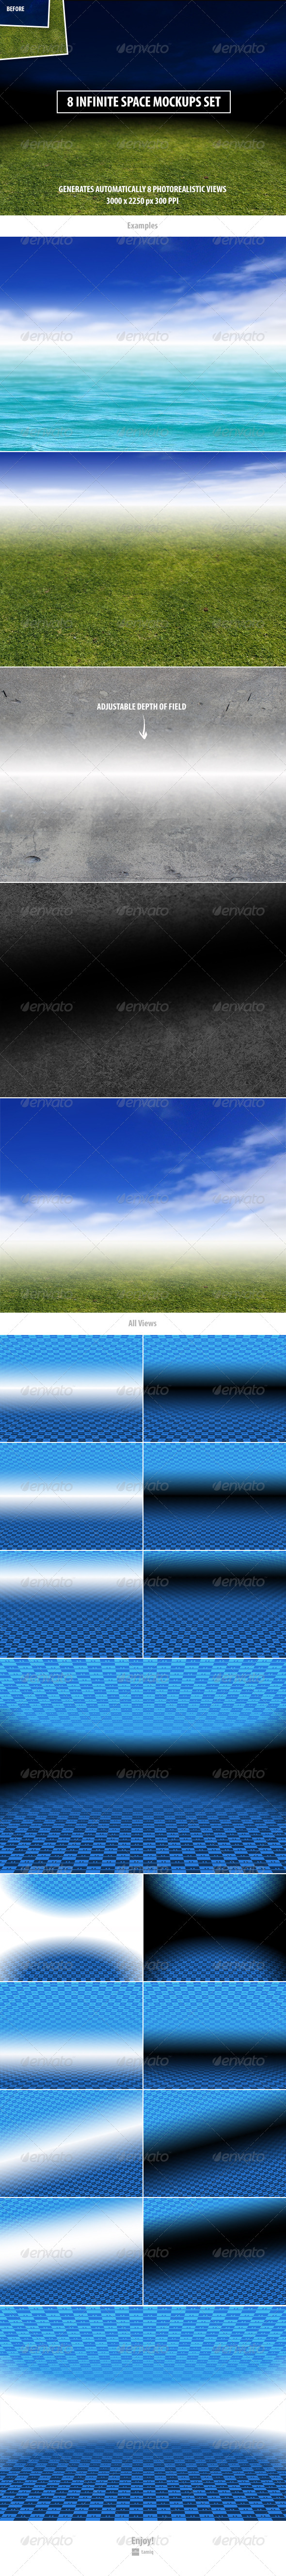 GraphicRiver 8 Infinite Space Mockups Set 8507881